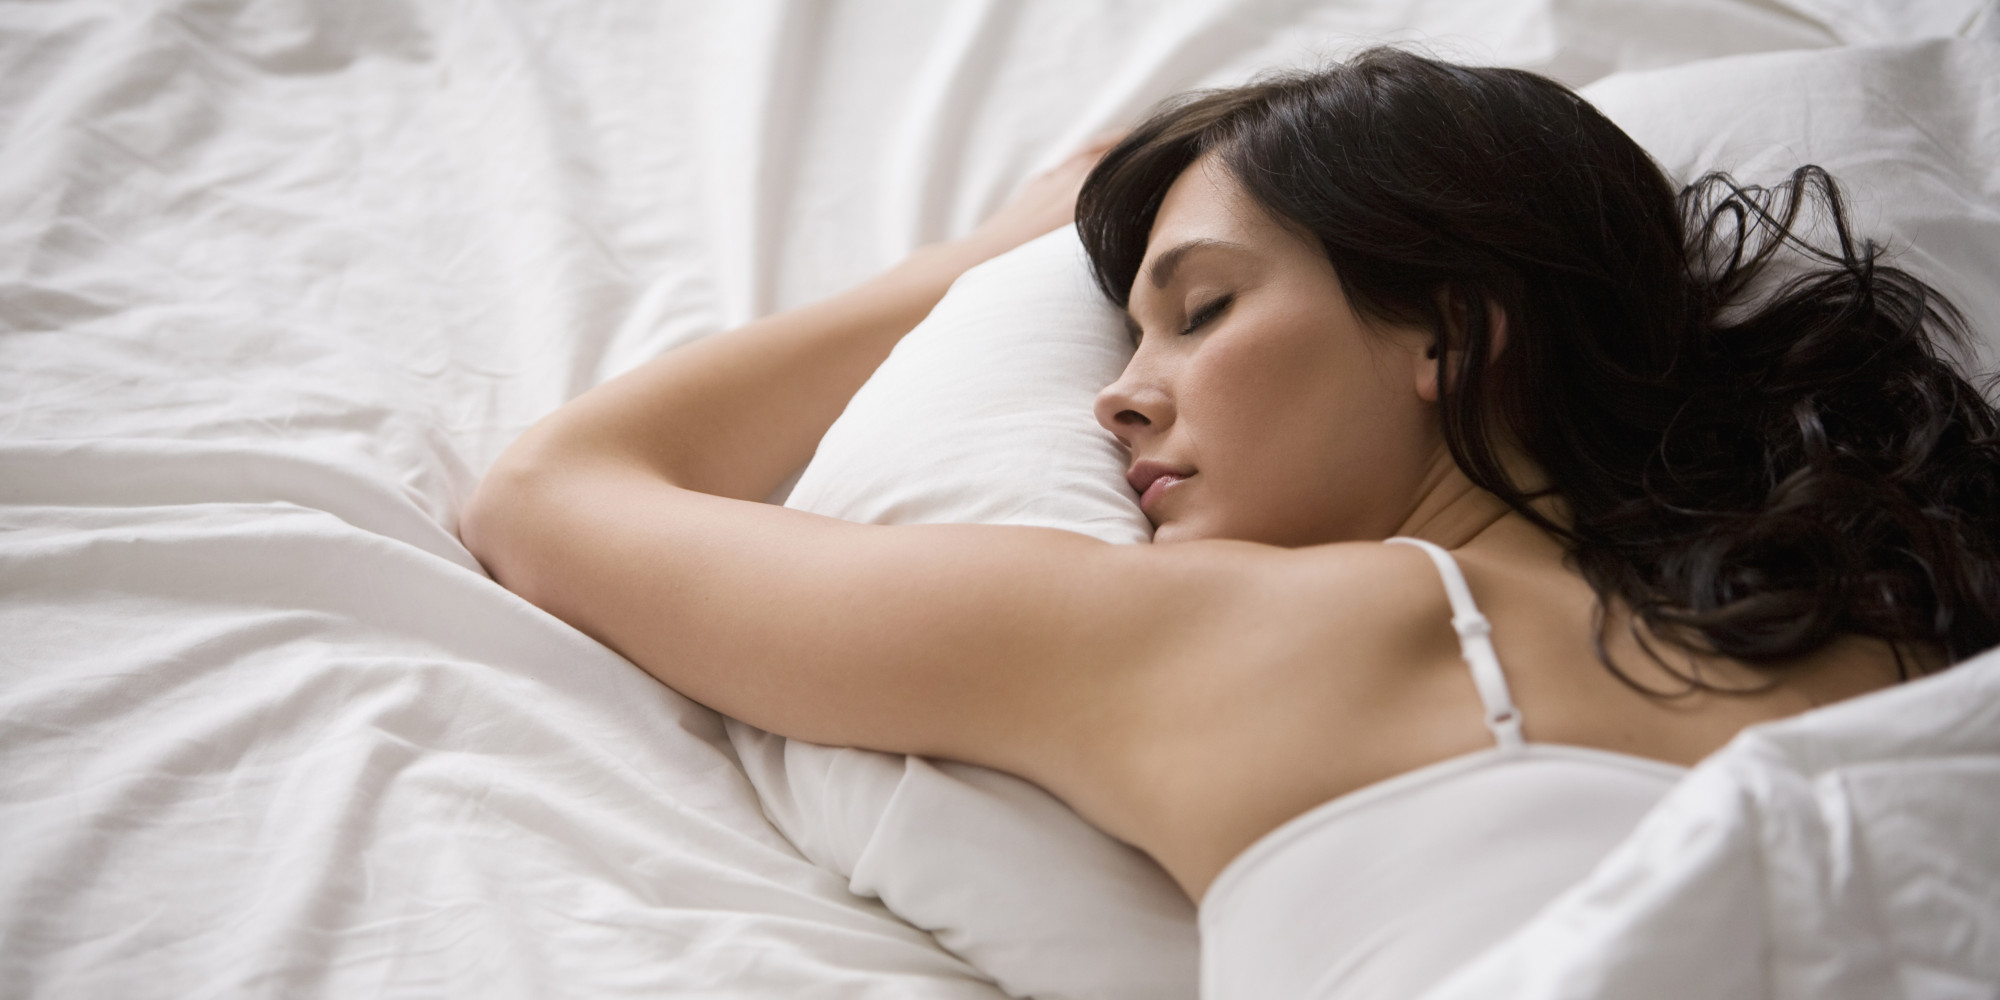 Caucasian woman sleeping in bed